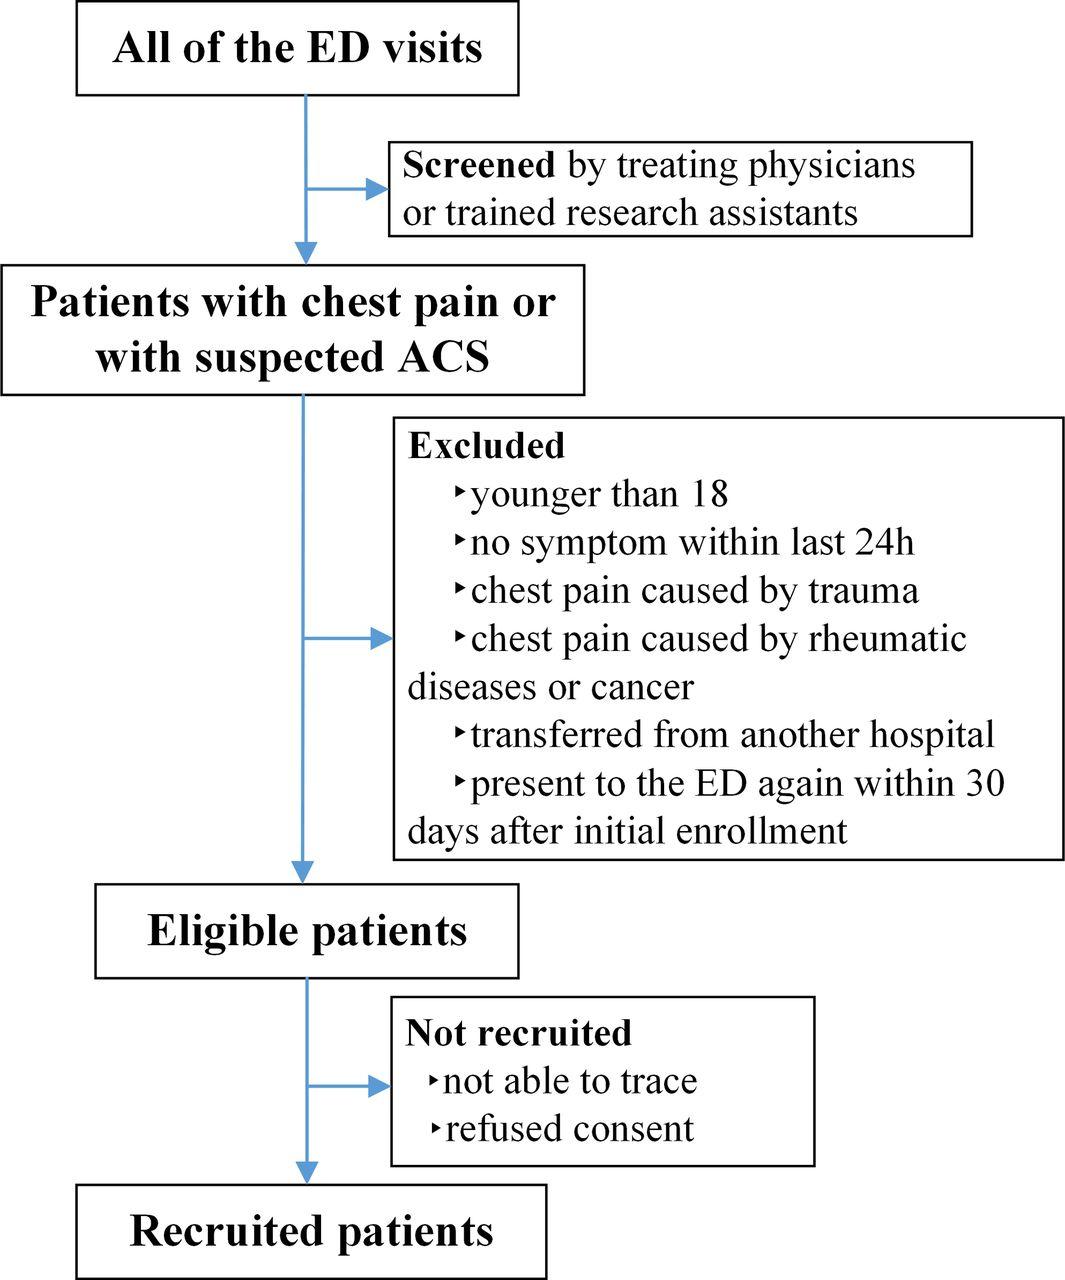 acute coronary syndrome guidelines australia